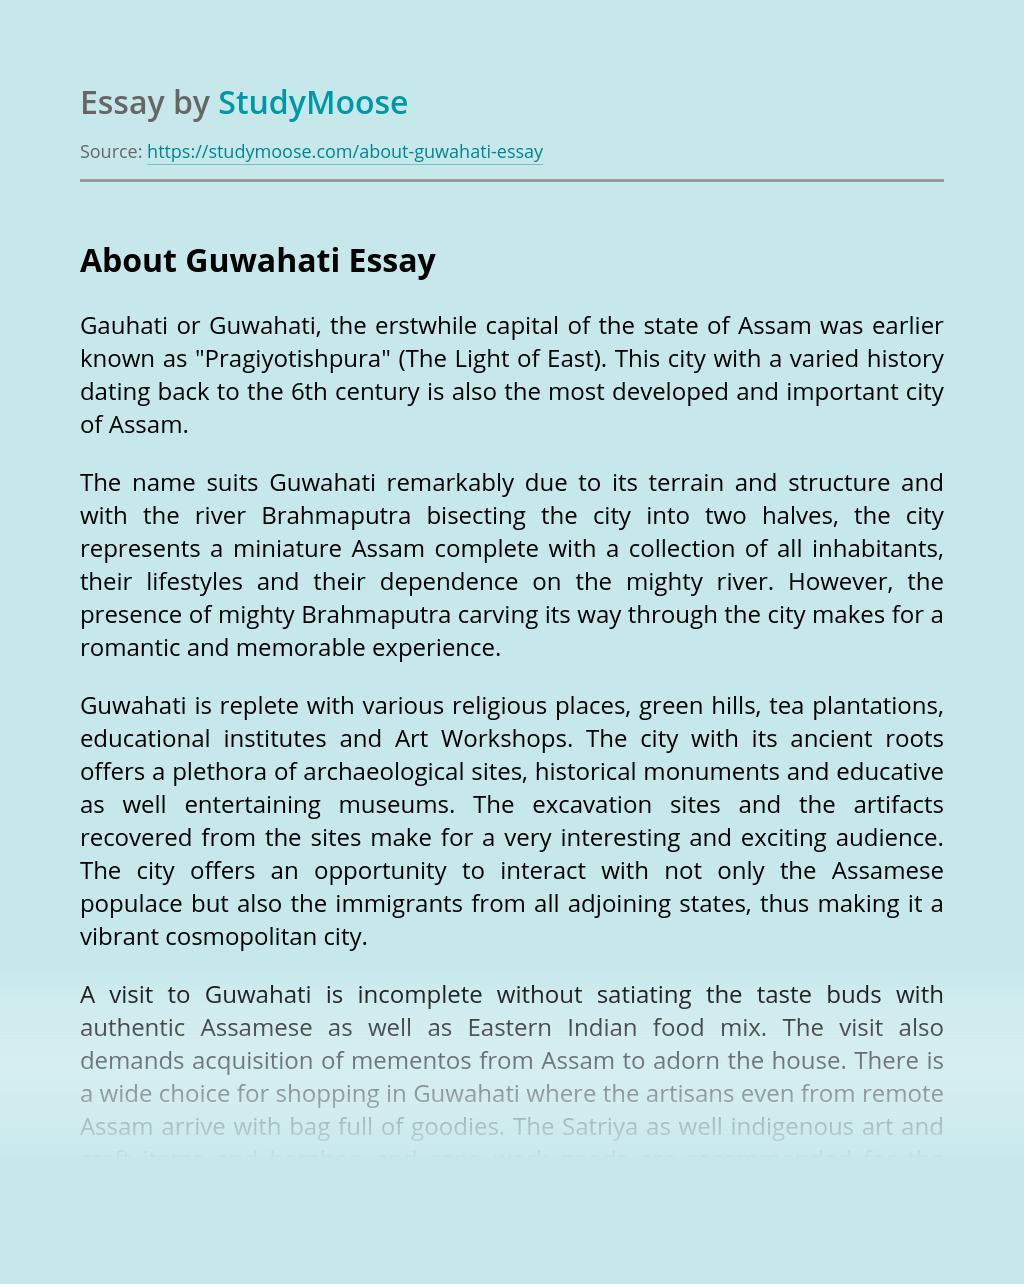 About Guwahati